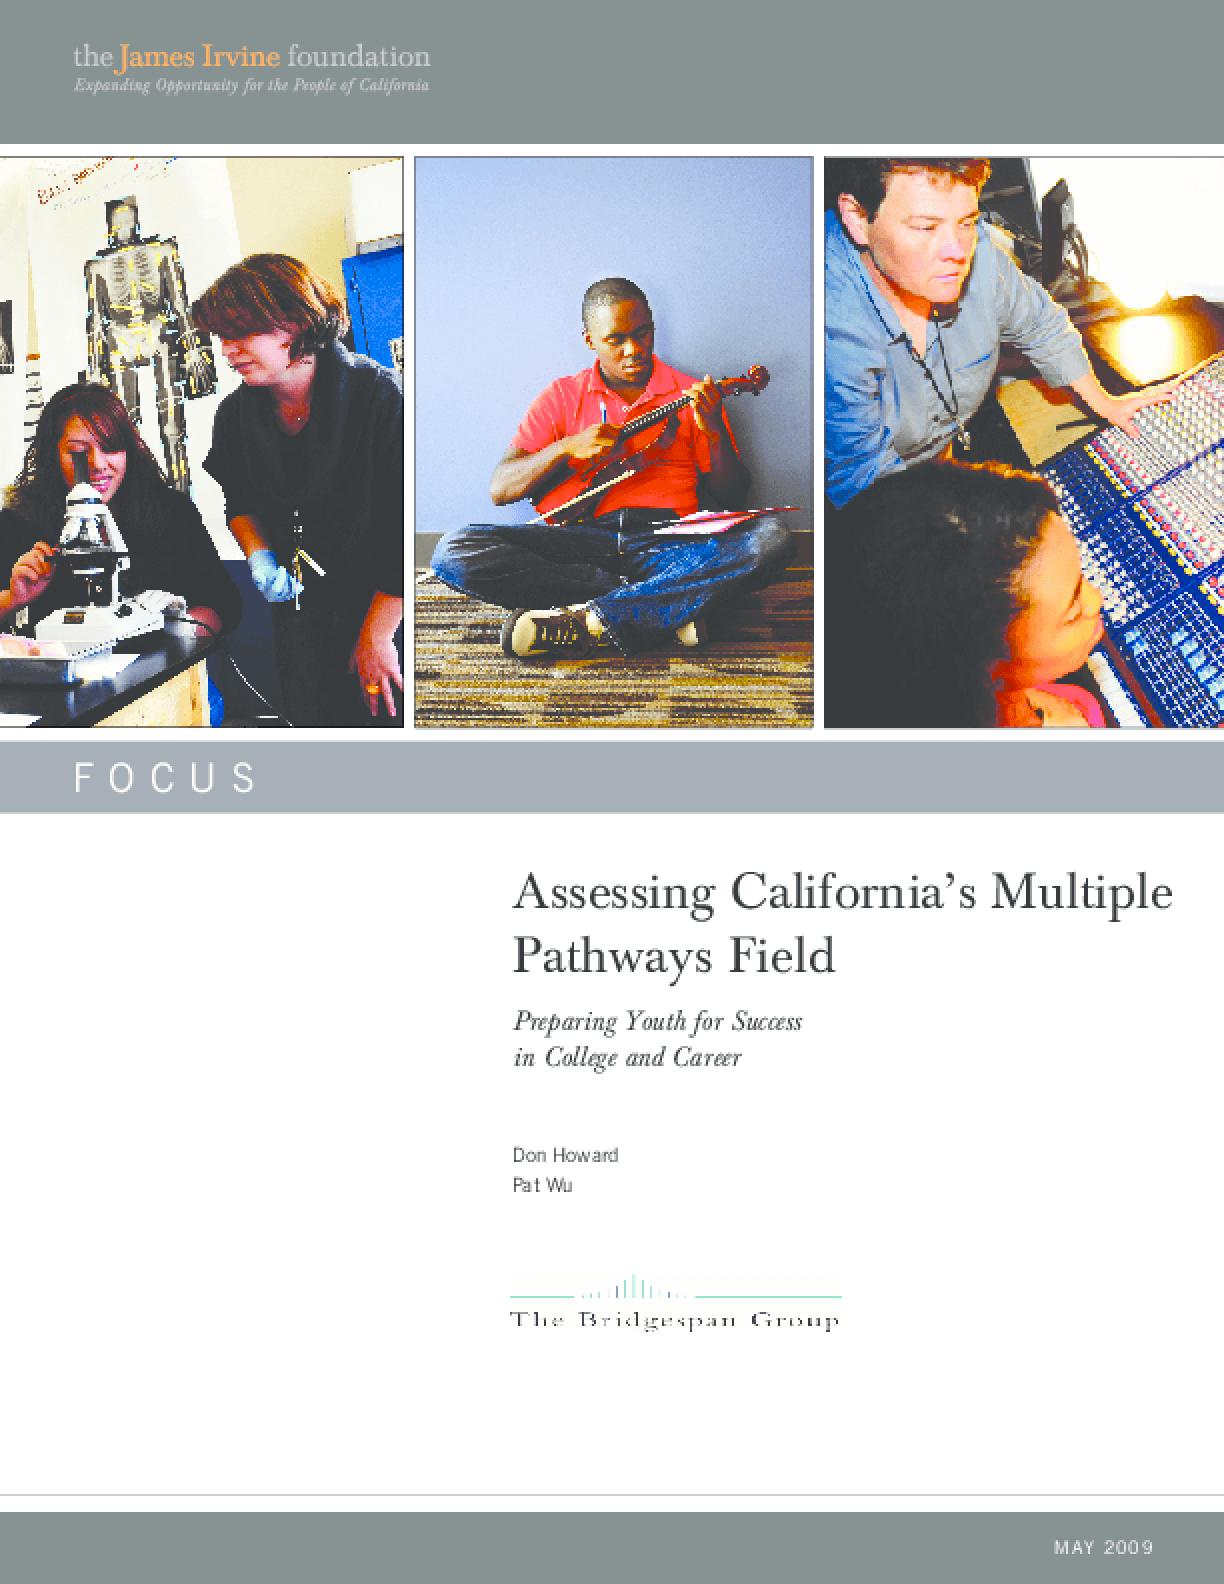 Assessing California's Multiple Pathways Field